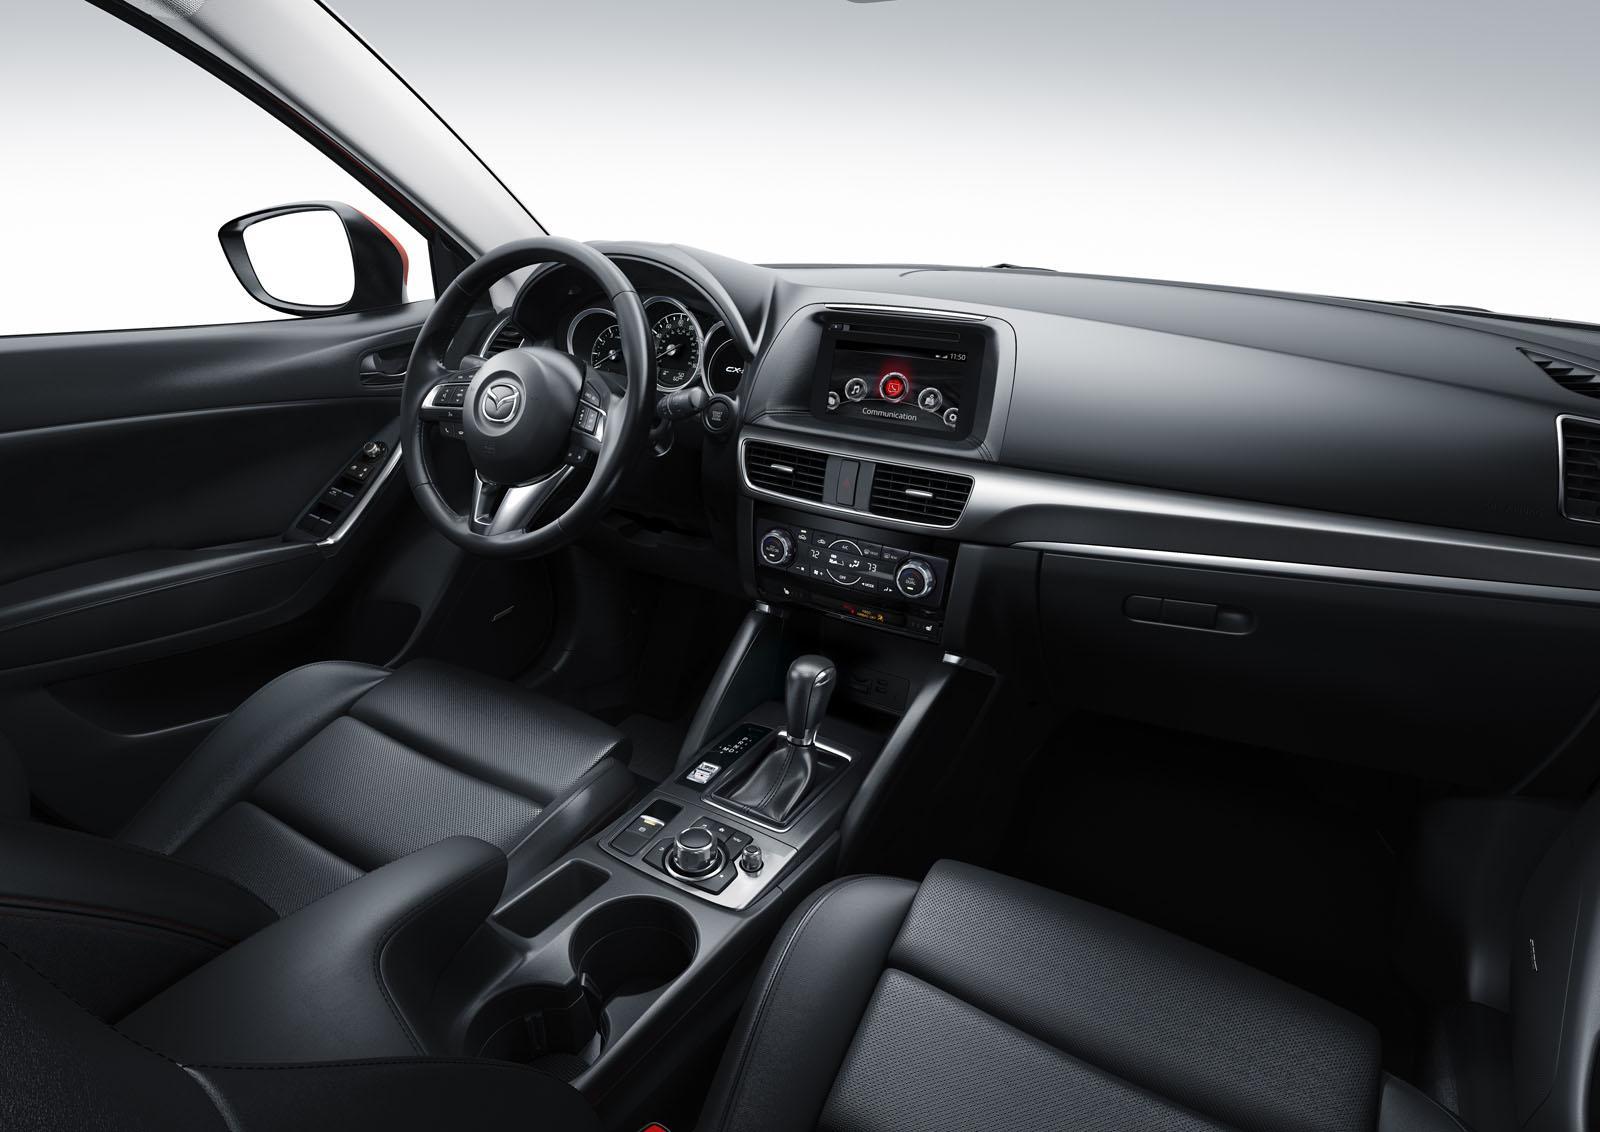 2015 Mazda Cx 5 Revealed At La Auto Show Performancedrive